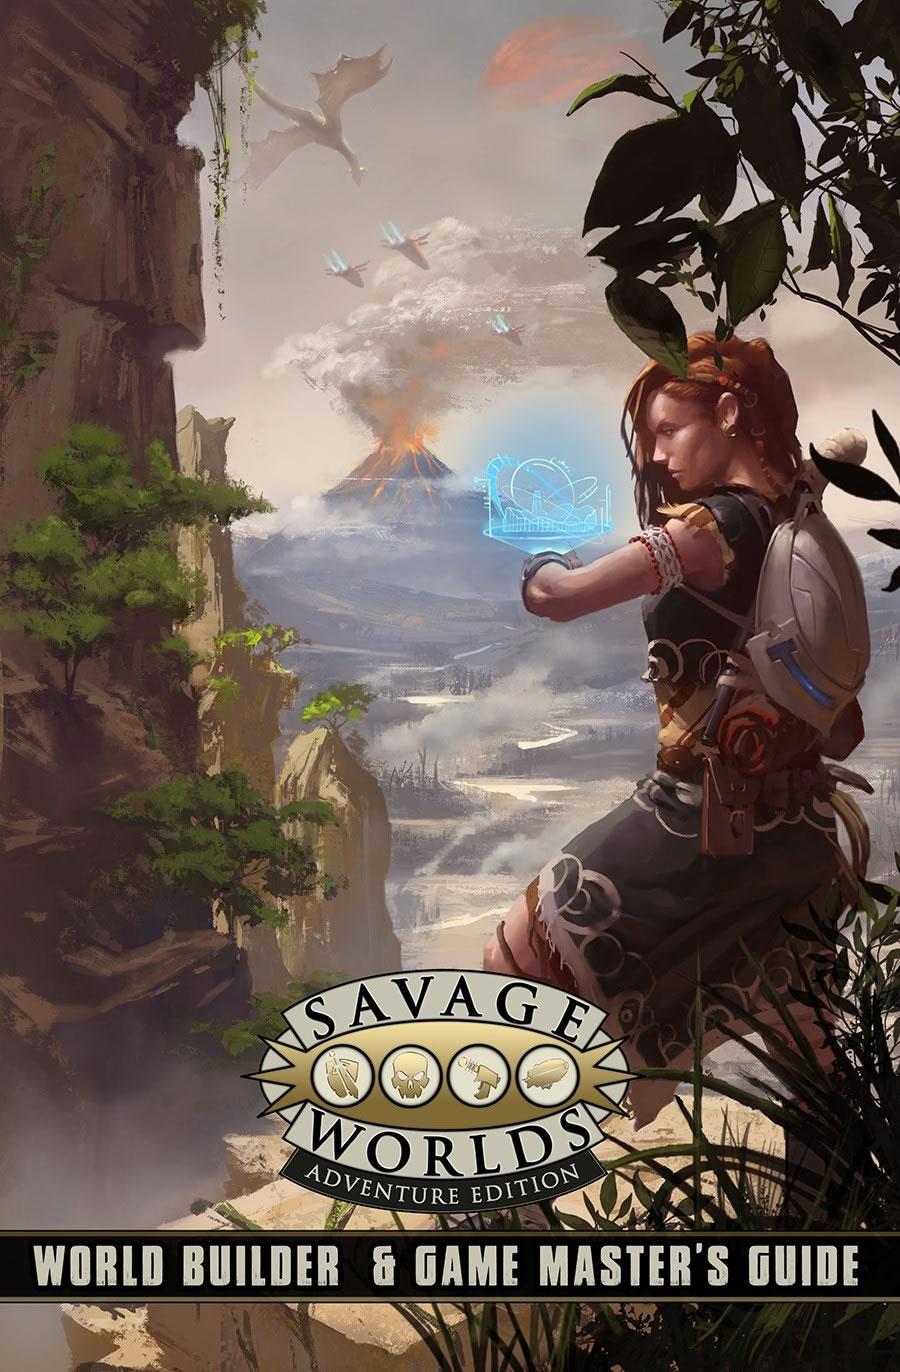 Savage Worlds Rpg: World Builder & Game Master`s Guide Game Box